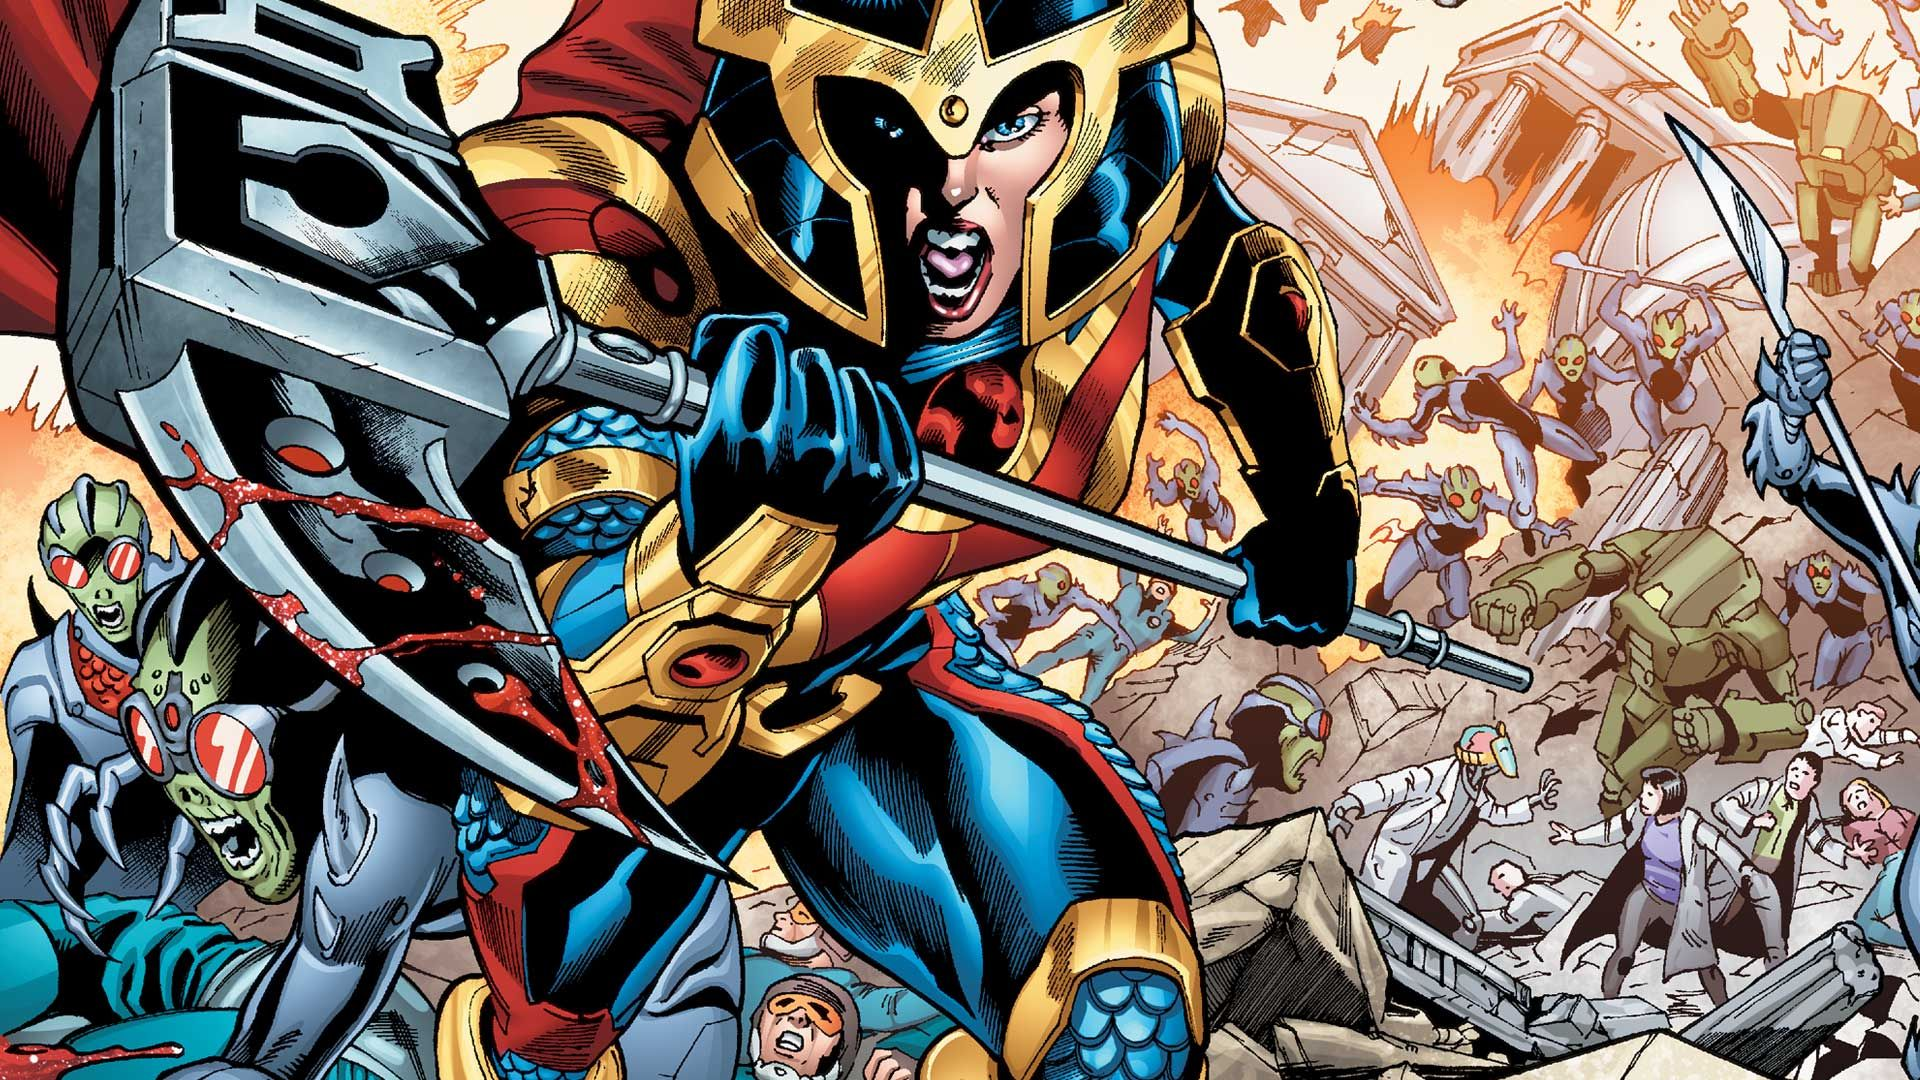 New Gods' DC Movie Finds Big Barda Superfan, Ava DuVernay